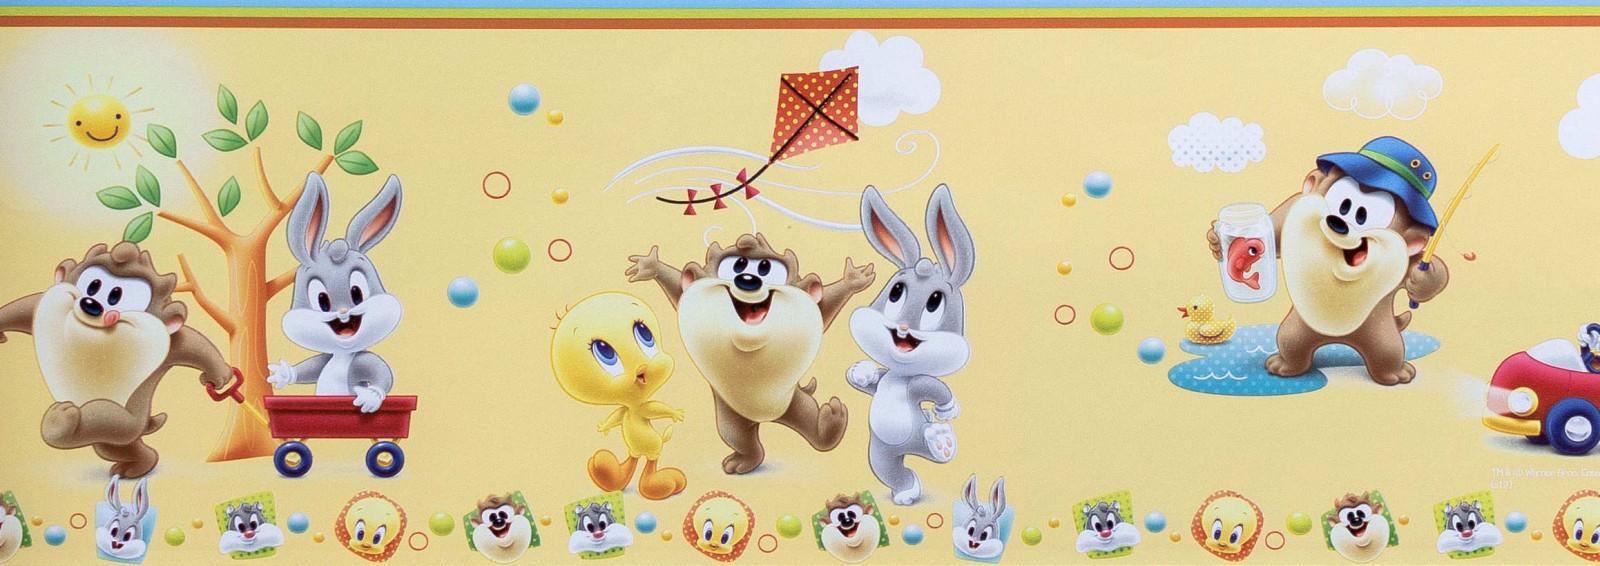 Baby looney tunes wallpaper border - photo#1